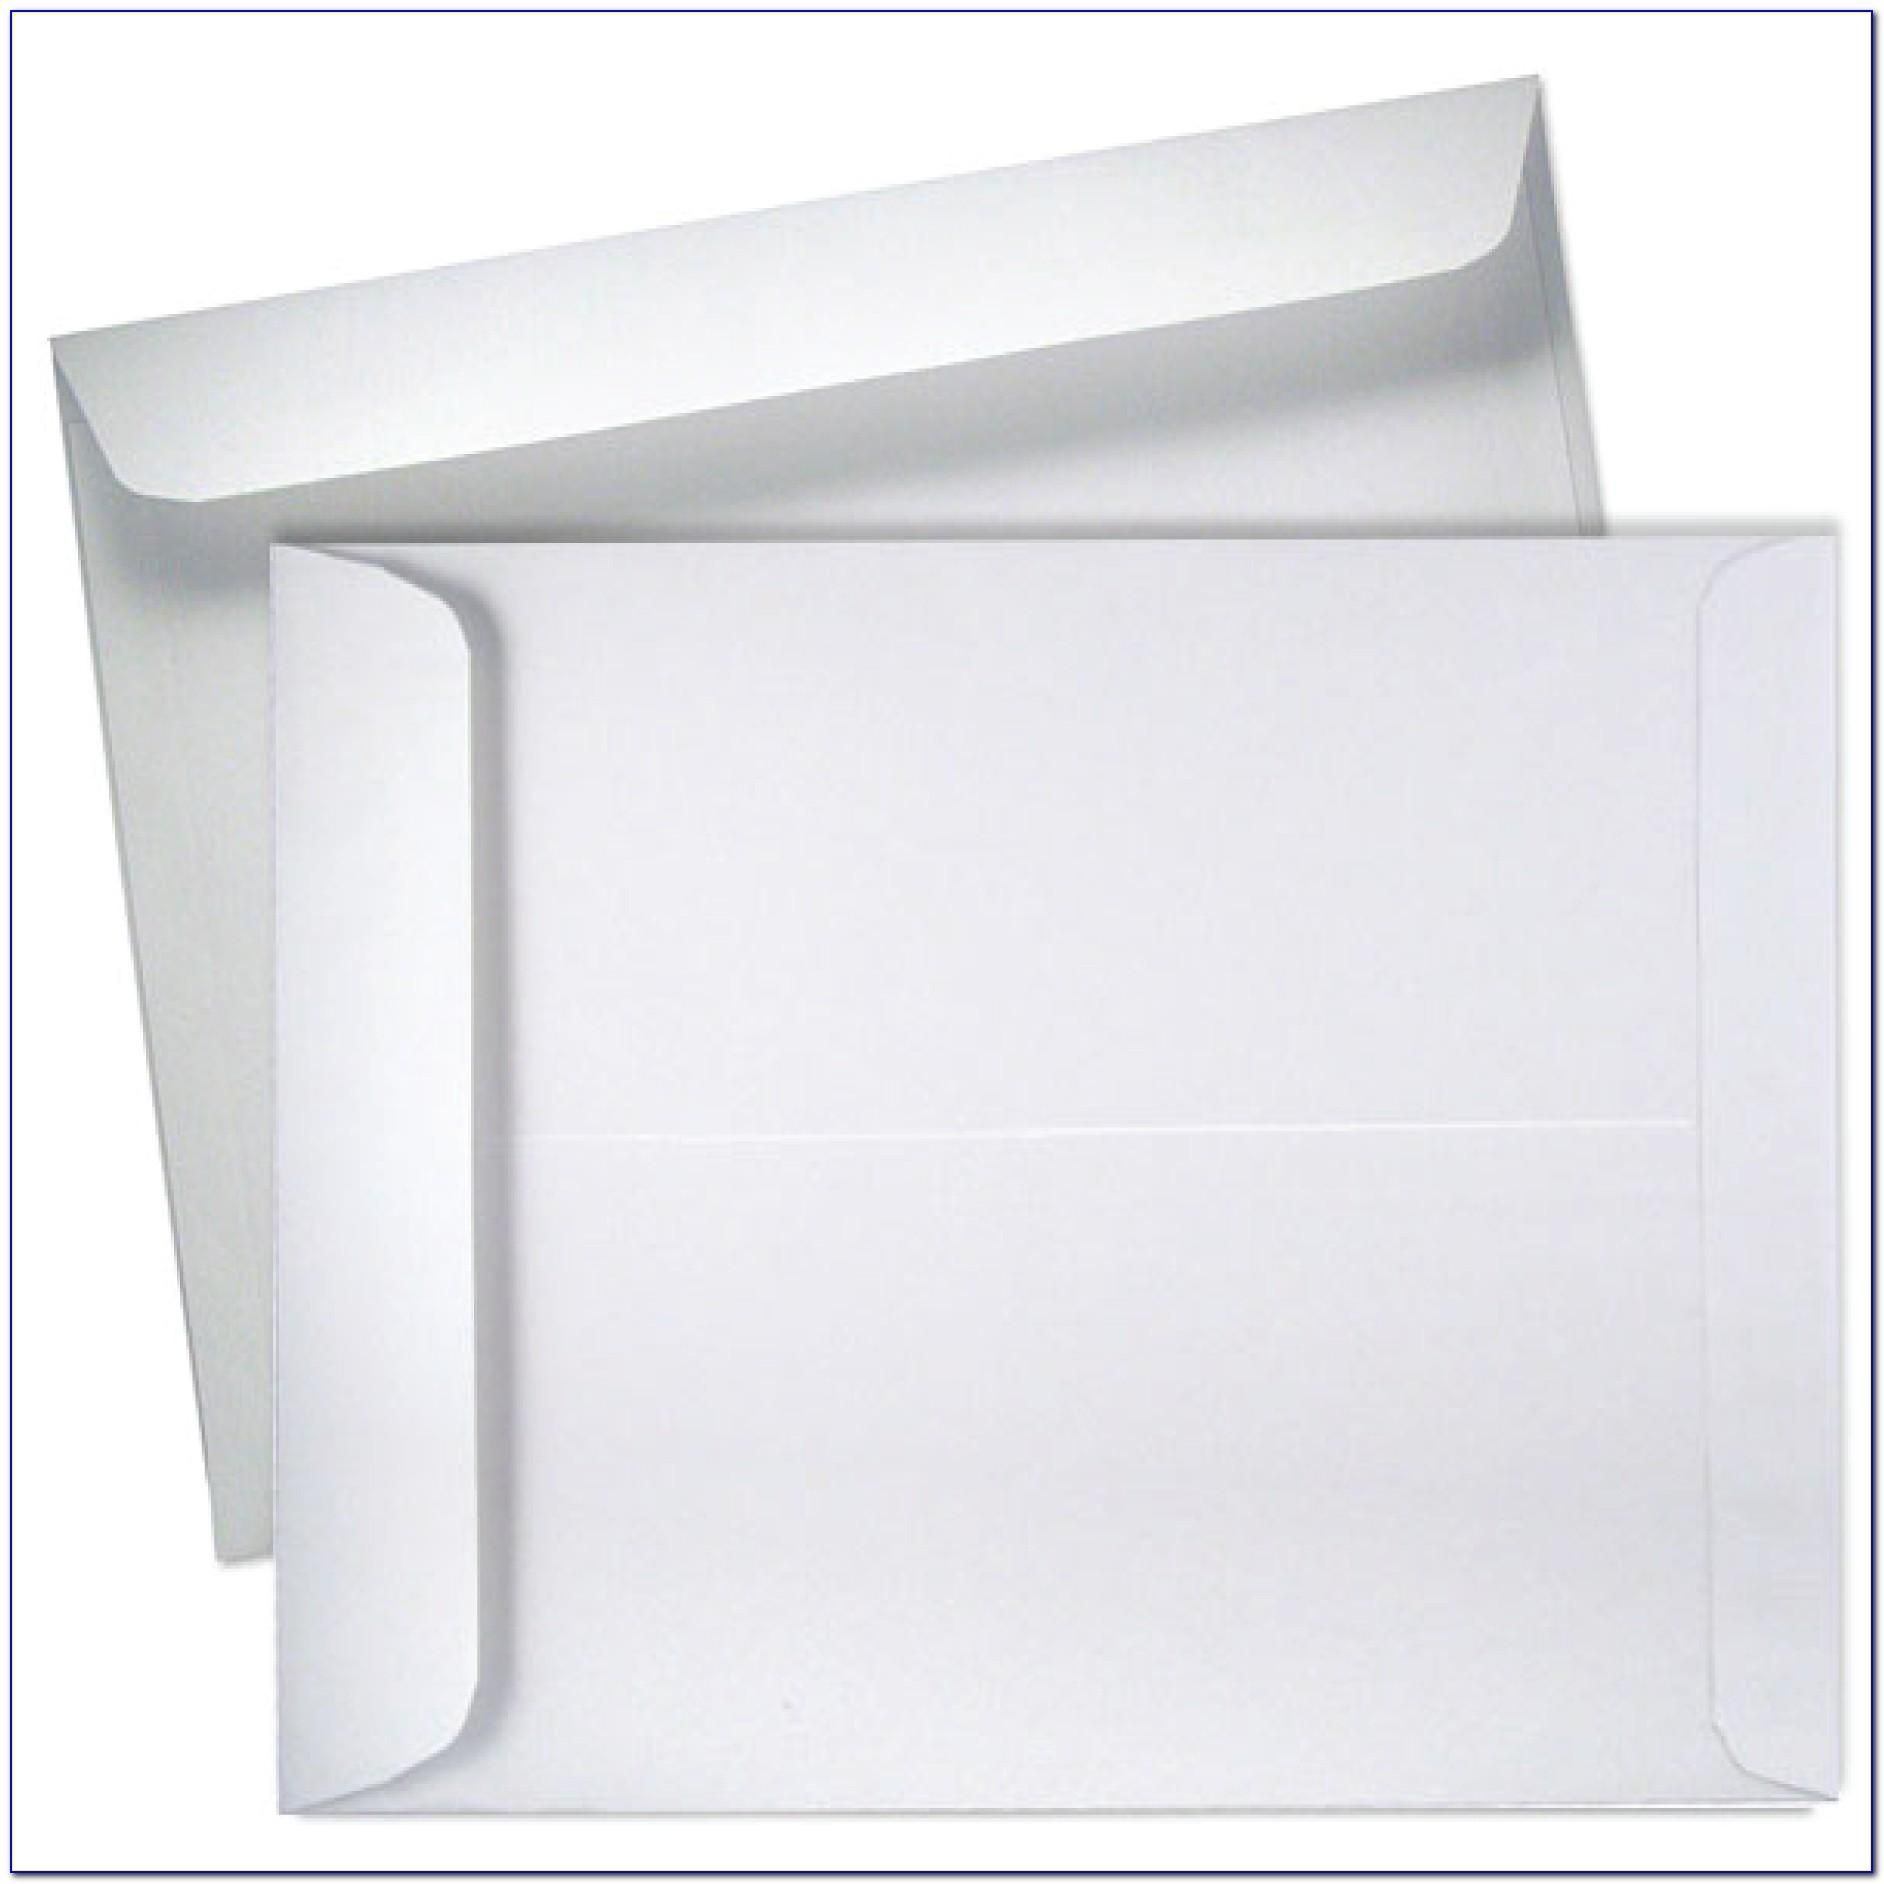 10 X 13 Booklet Envelope Template